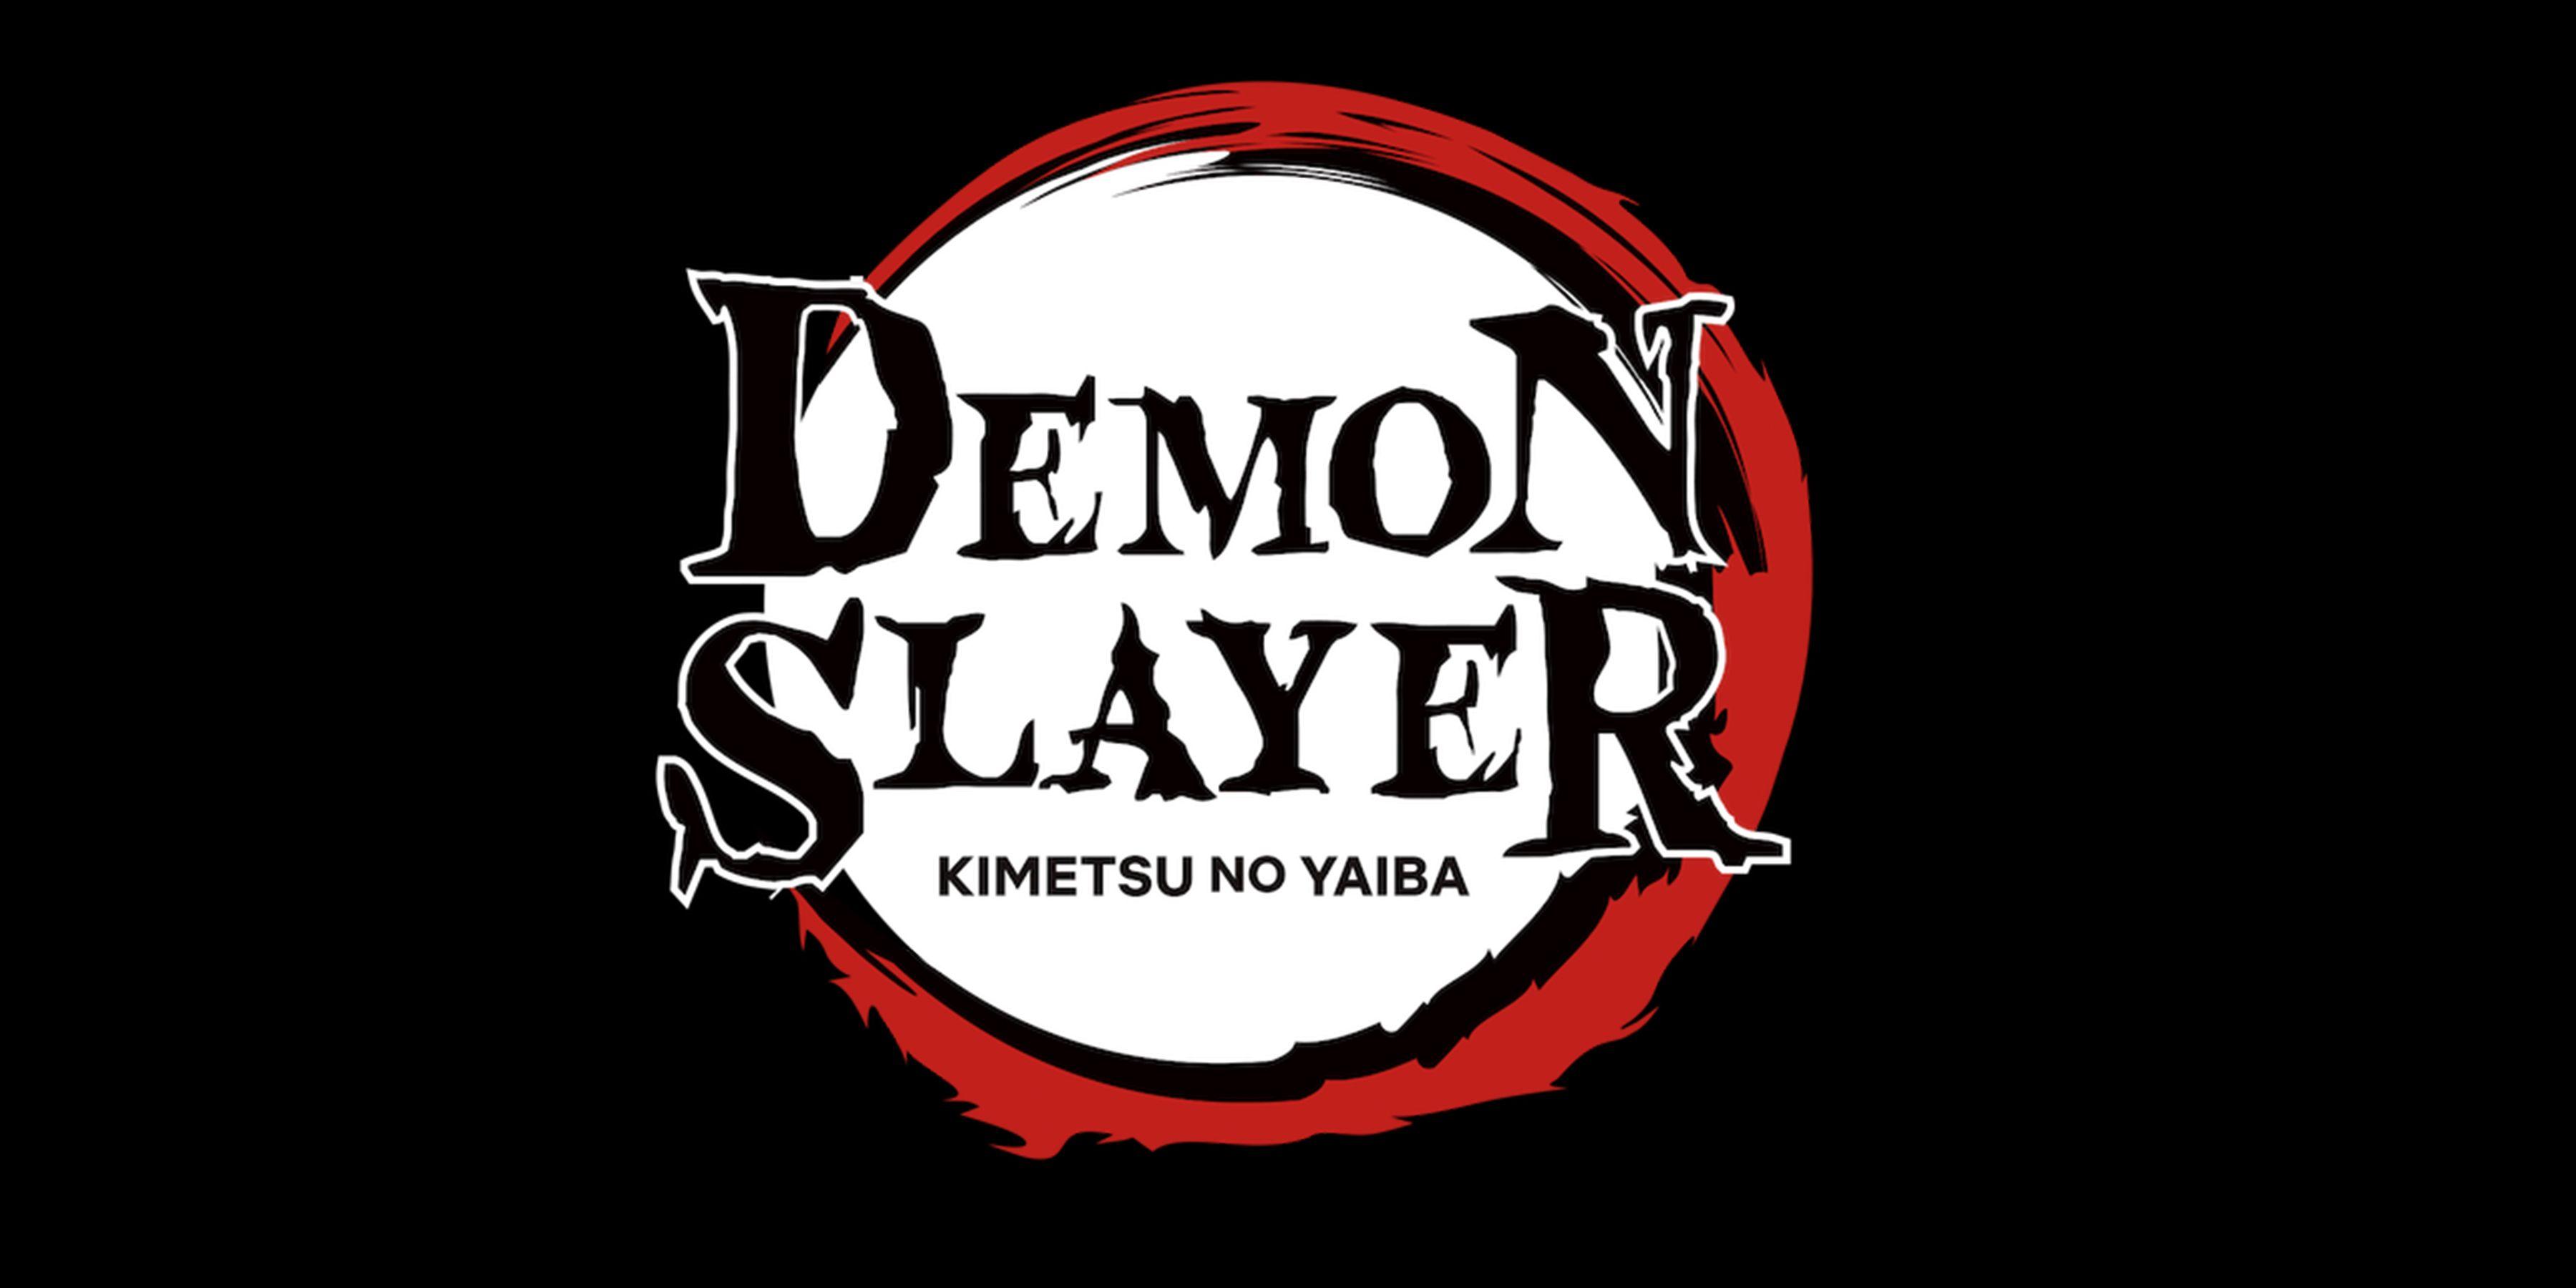 Kimetsu No Yaiba Logo Face Mask Slayer Face